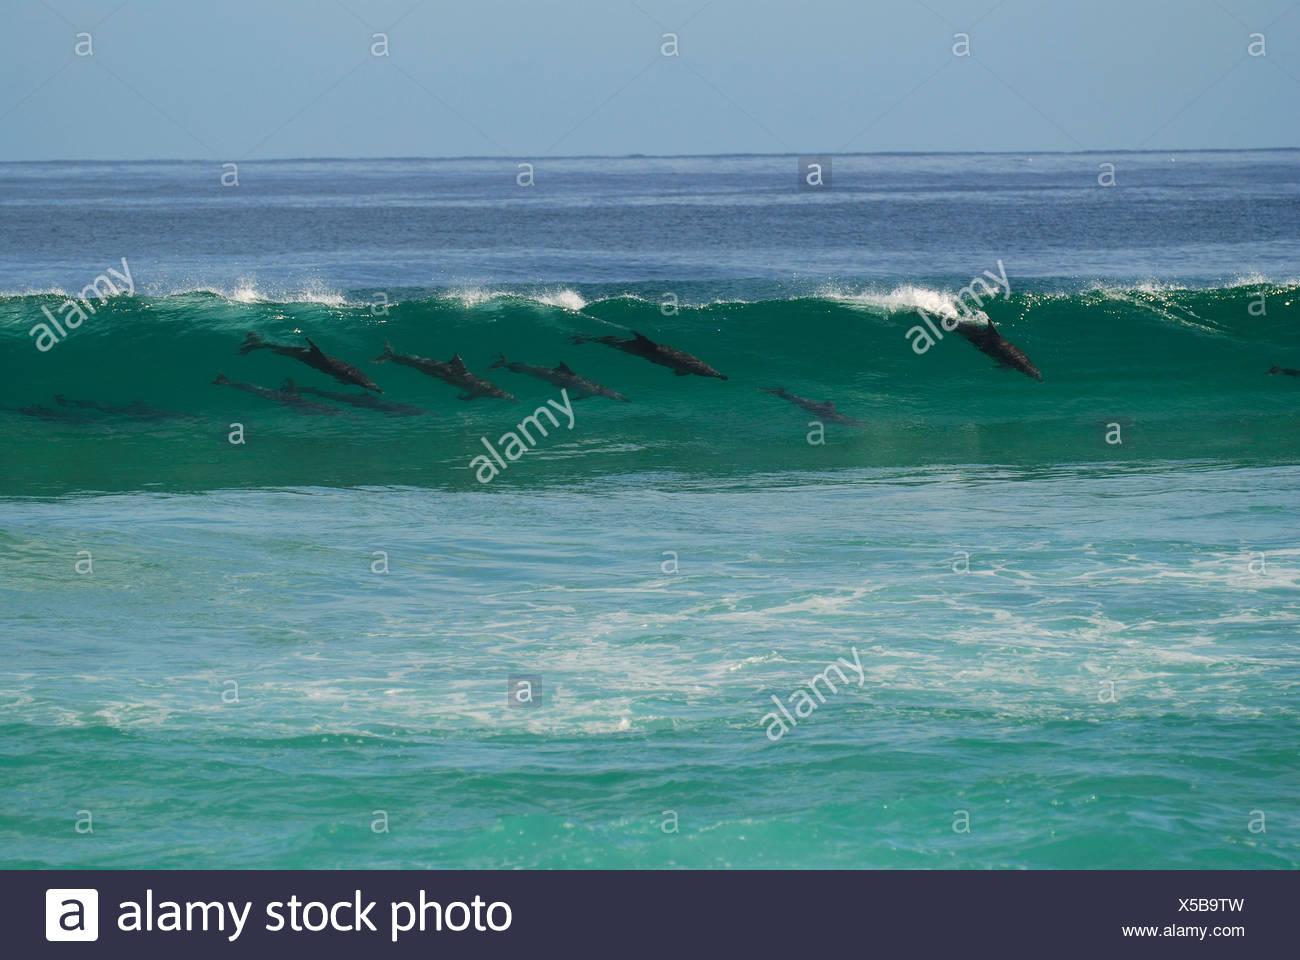 Bottlenose dolphins Tursiops truncatus surfing wave Myall Lakes Nat Park NSW Australia - Stock Image